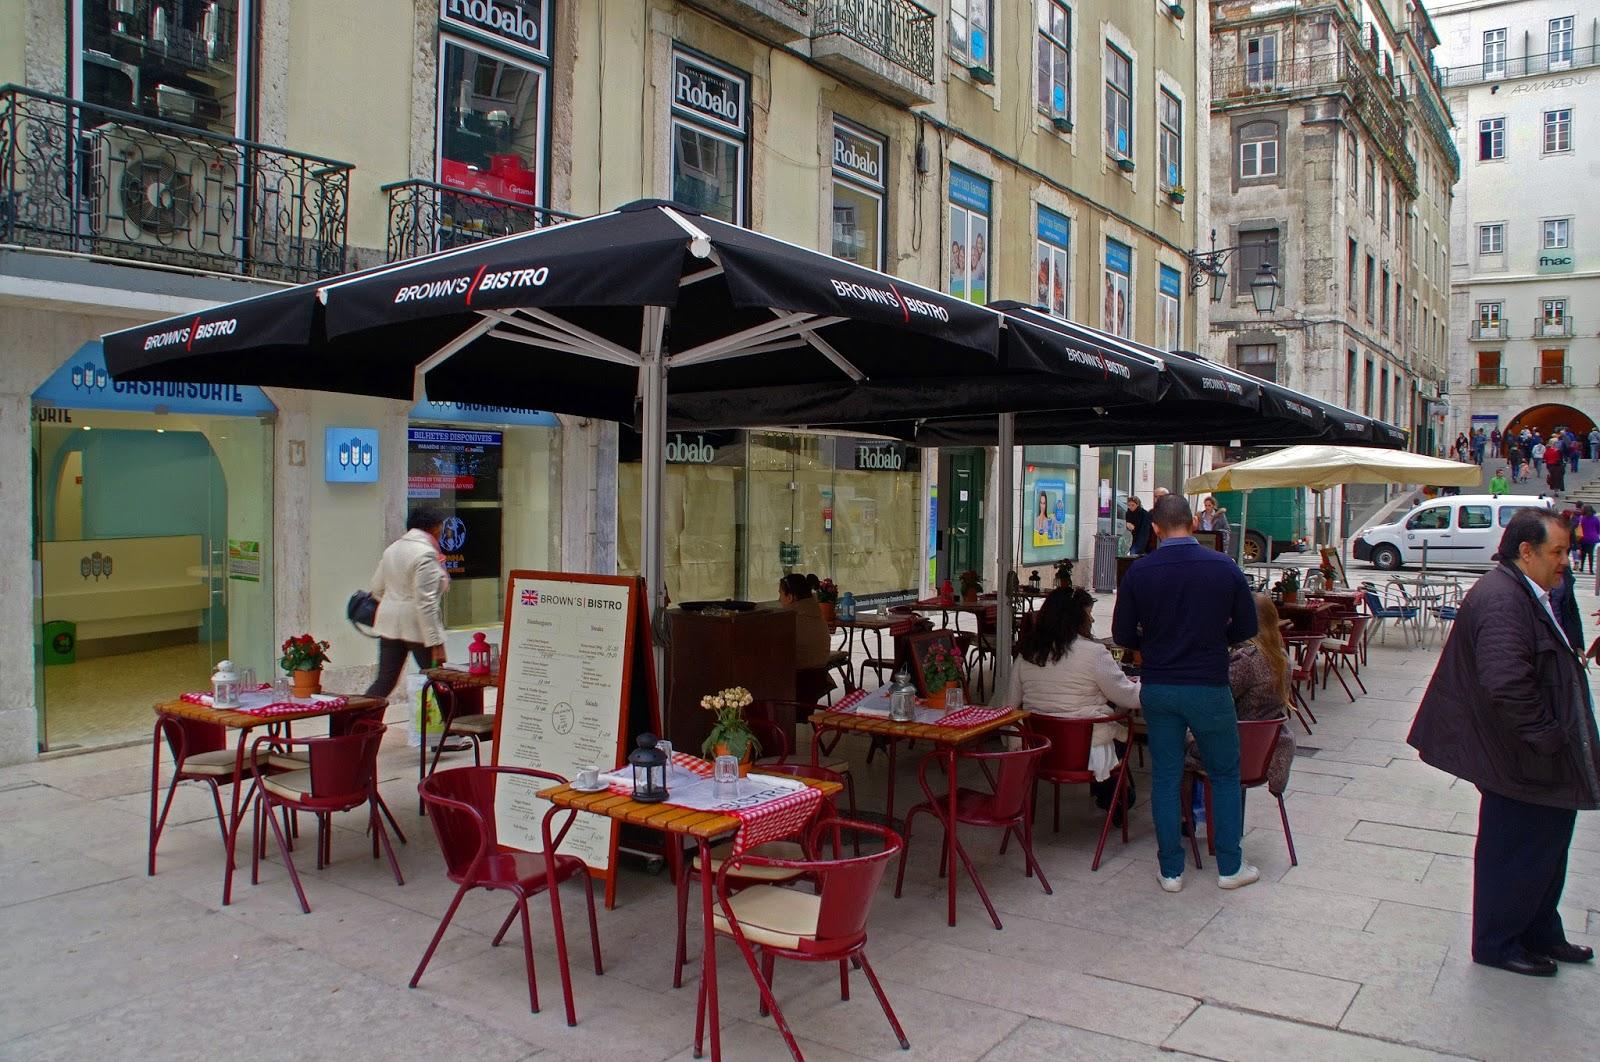 Brown's Central Hotel Lisbon Bistro